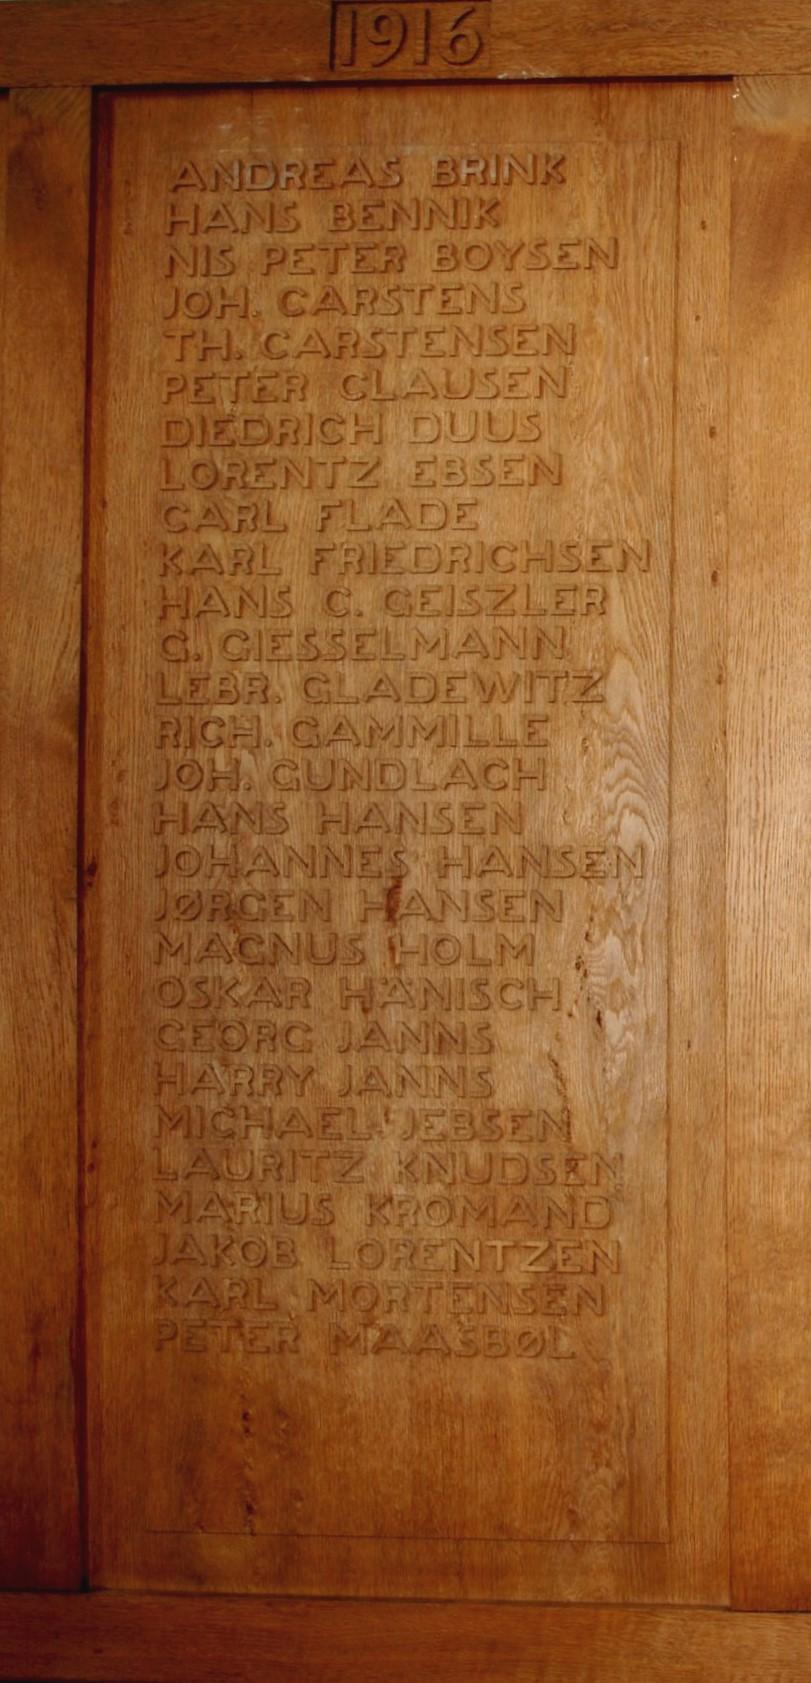 Detalje af mindetavle, Skt. Nicolai Kirke, Aabenraa